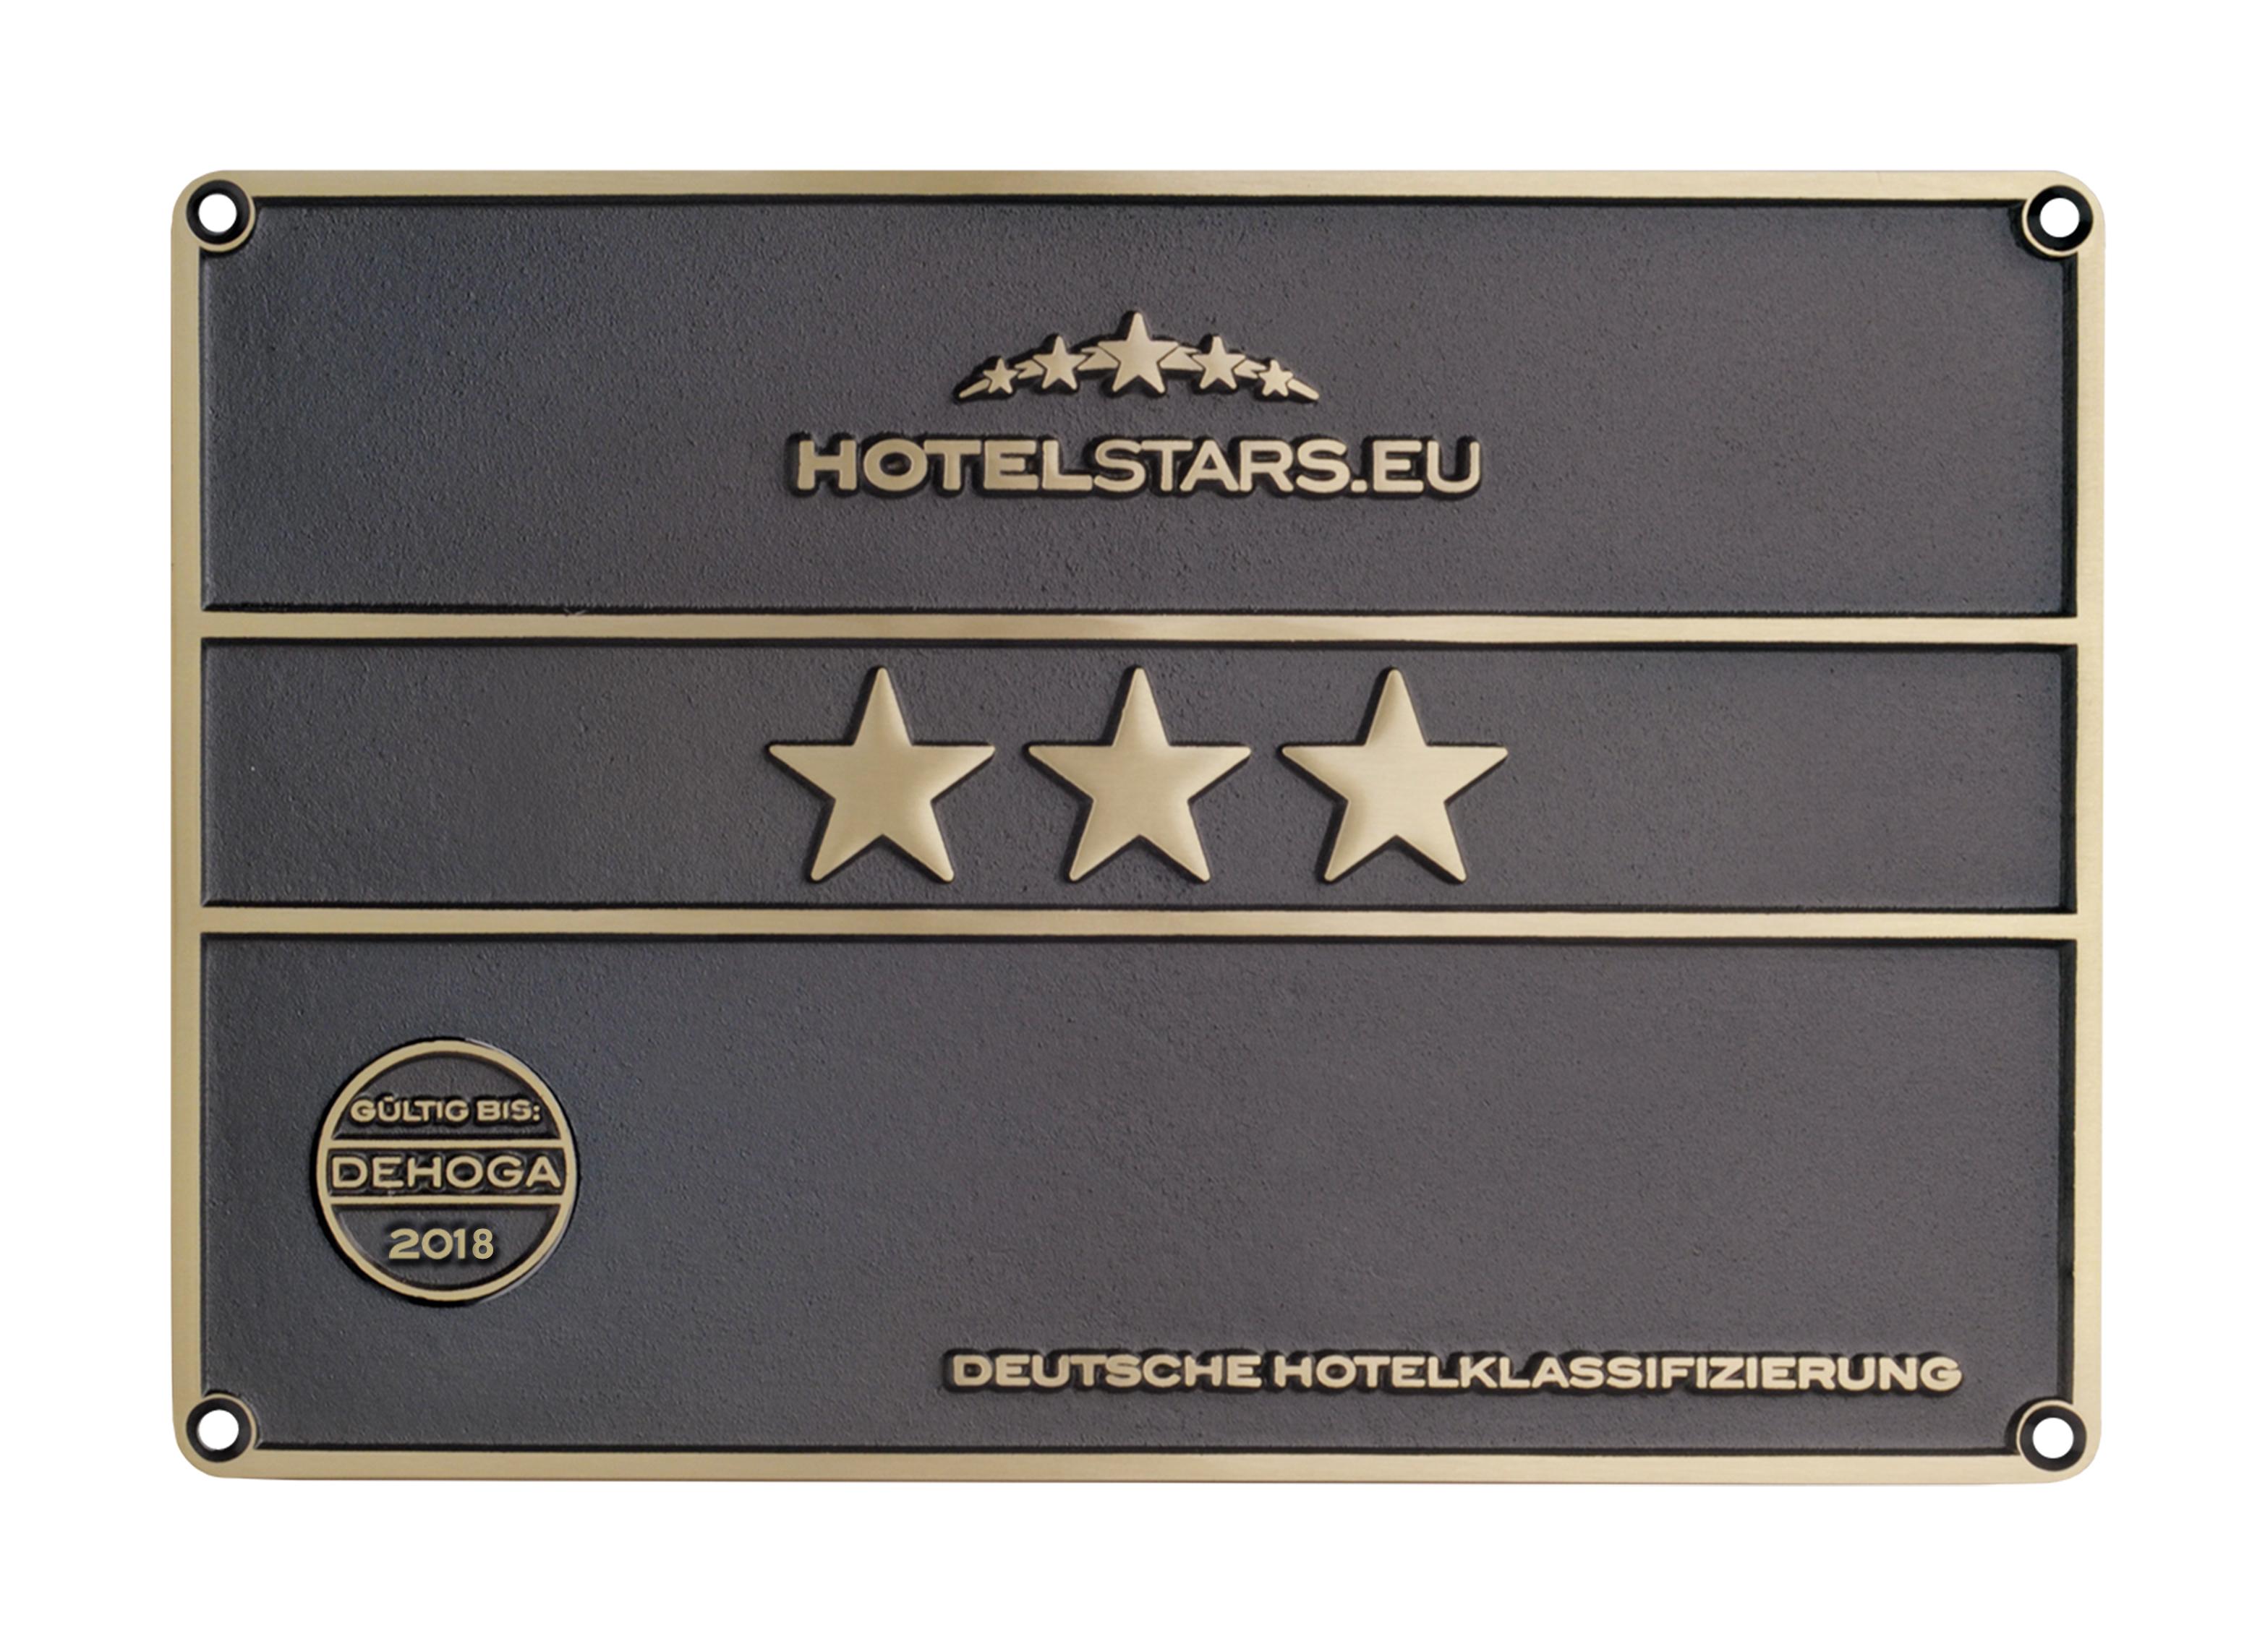 DEHOGA Hotelklassifizierung 3 Sterne